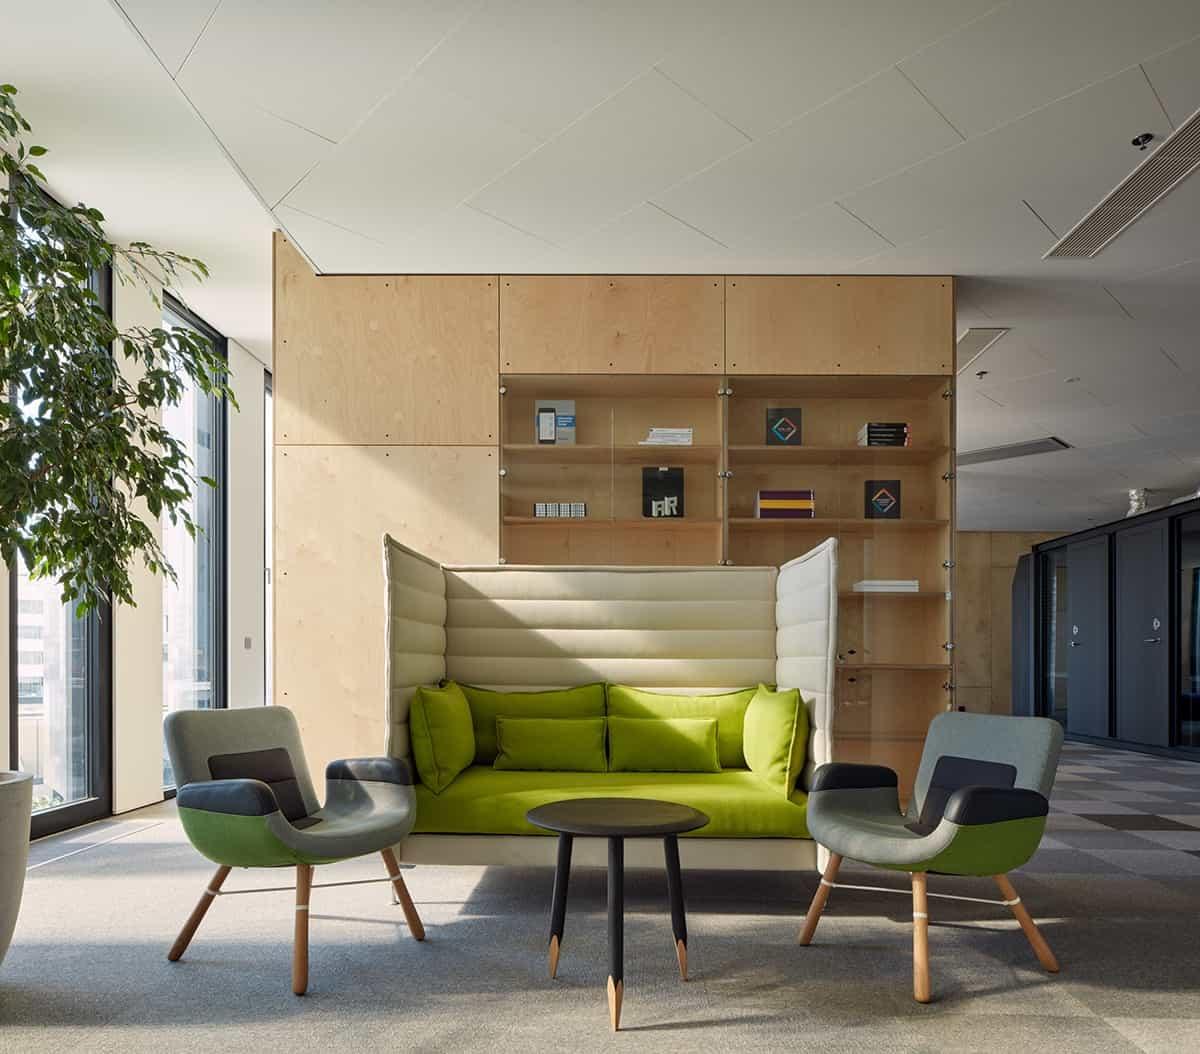 Design Inspiration - Break Out   Grosvenor Workspace Solutions 10